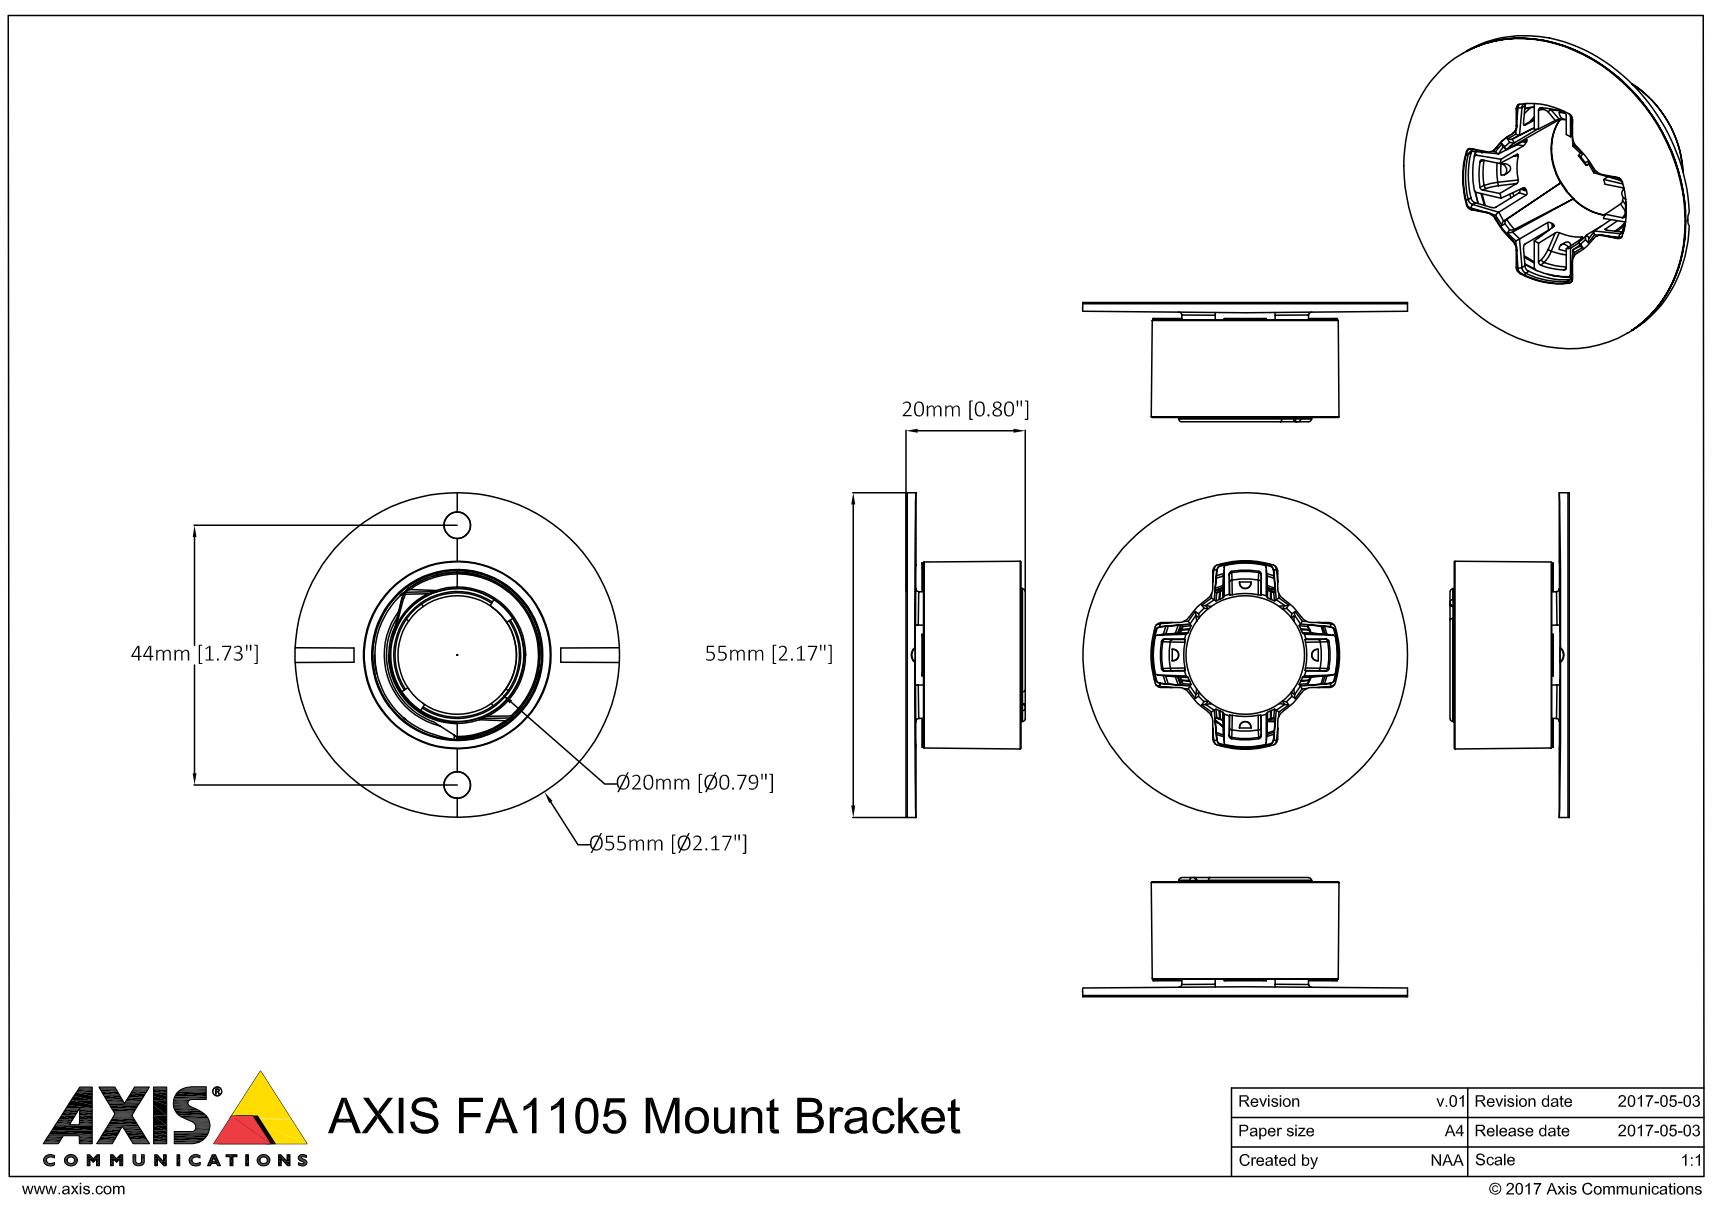 FA1105 Bracket Dimensions